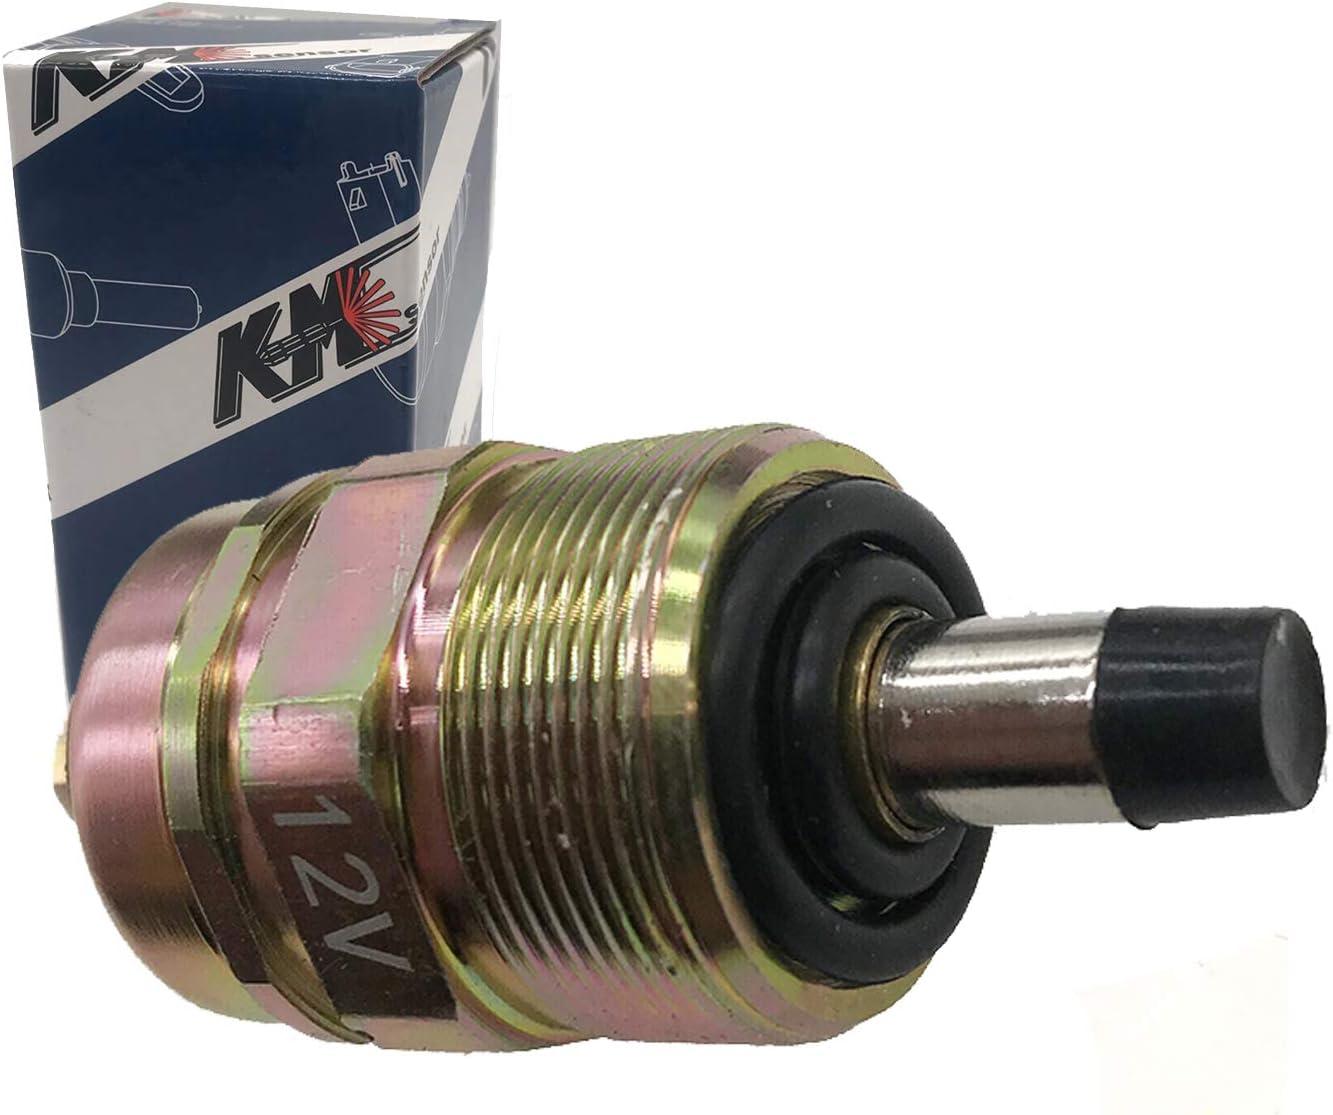 0330001016 24V VE Fuel Injection Pump 0330001047 Rotary Diesel Shut Off Solenoid Valve